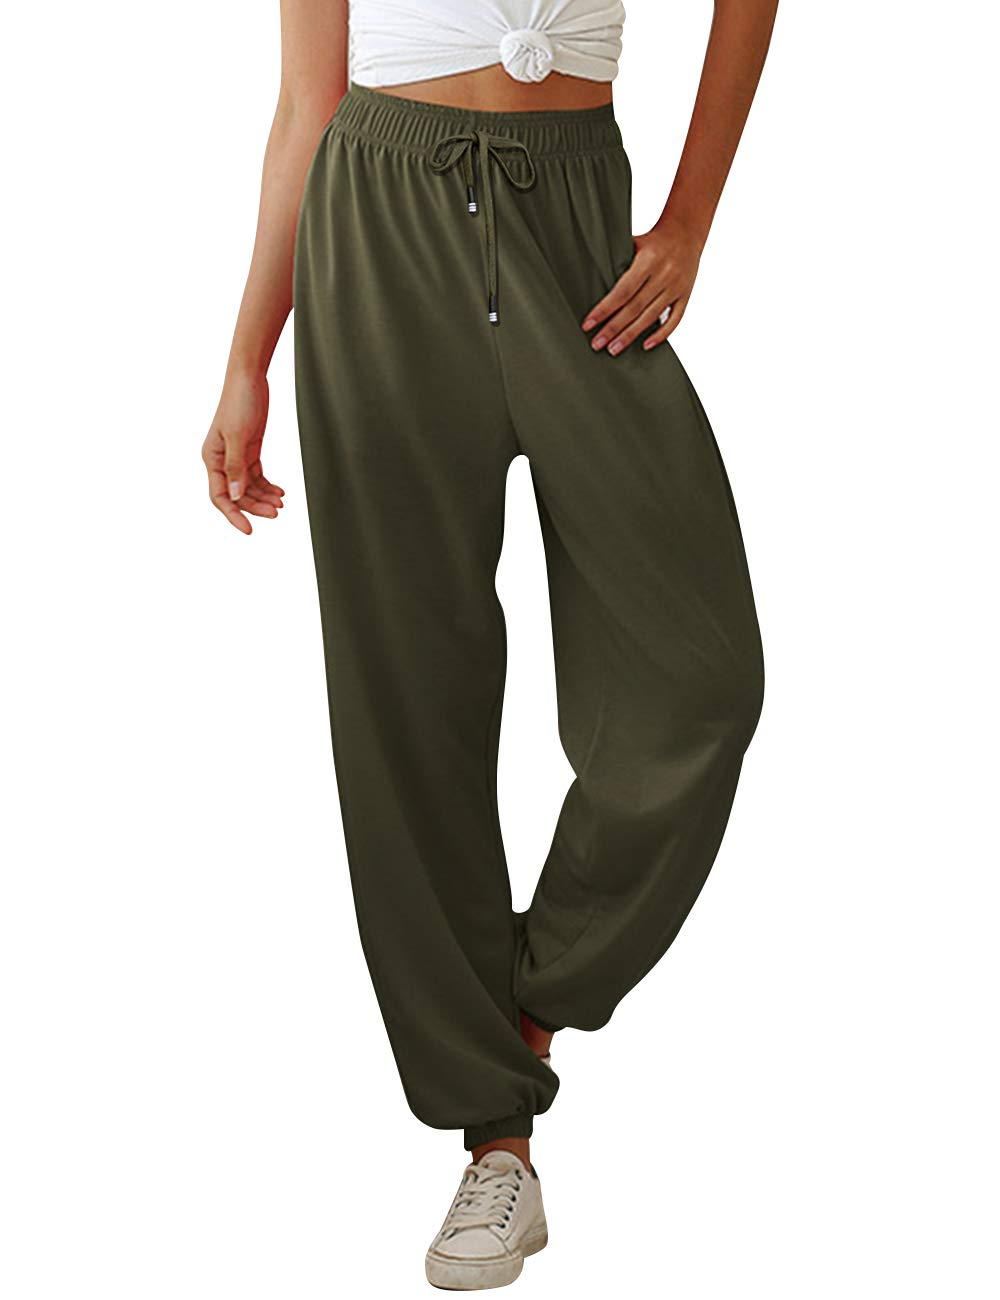 MoneRffi Drawstring Sweatpants with Pockets Womens Casual Oversized Jogging Joggers Tracksuit Bottoms Athletic Pants Drawstring Sweatpants with Pockets